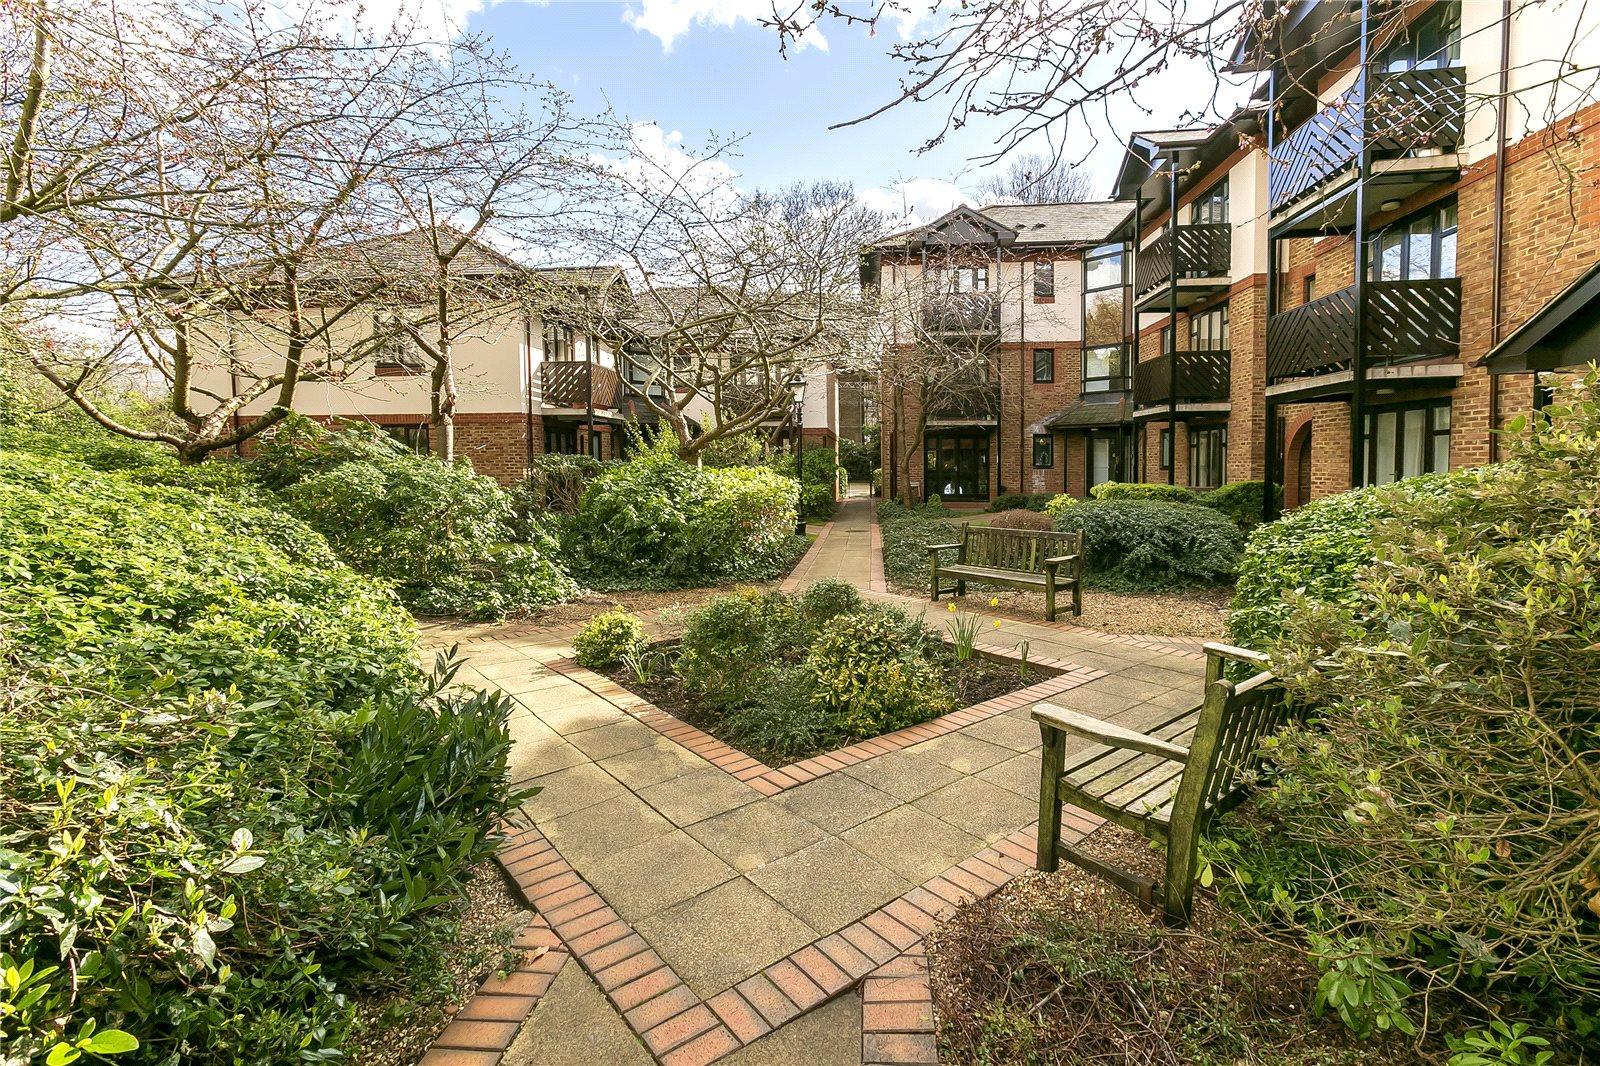 Lichfield Gardens, Richmond, TW9 1AP - Antony Roberts